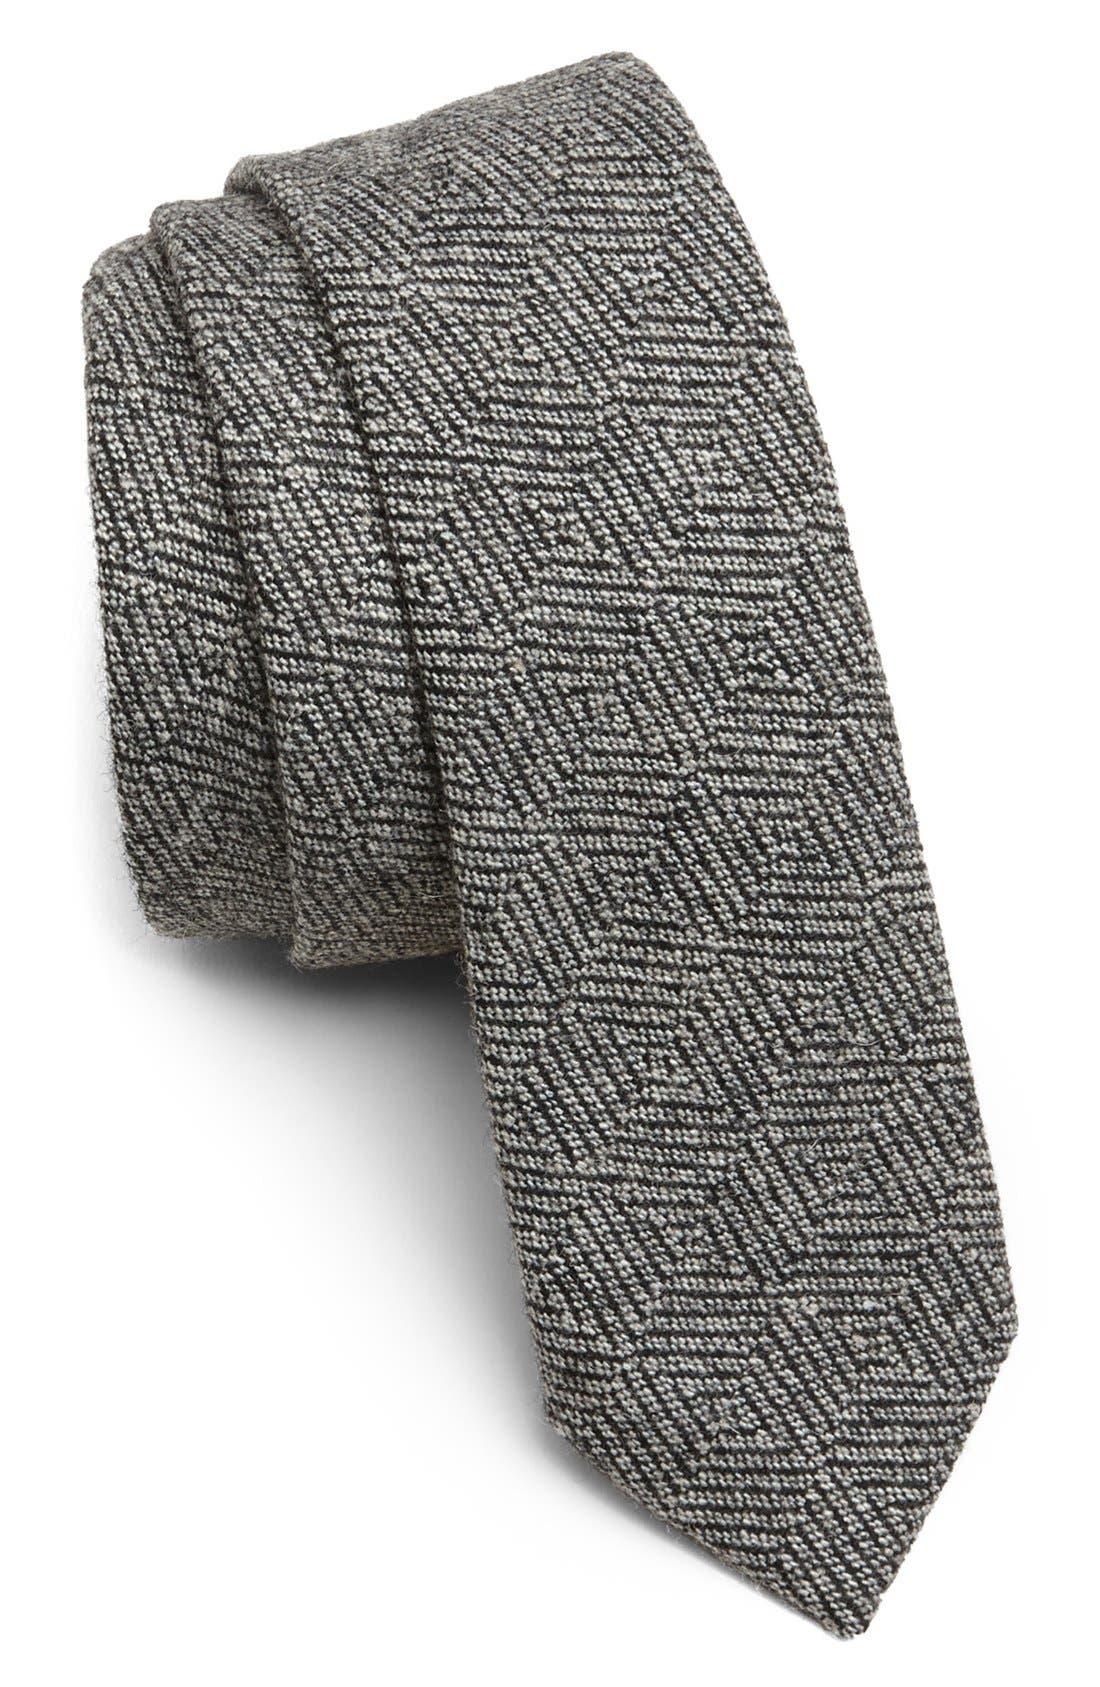 Alternate Image 1 Selected - Topman Herringbone Check Woven Tie